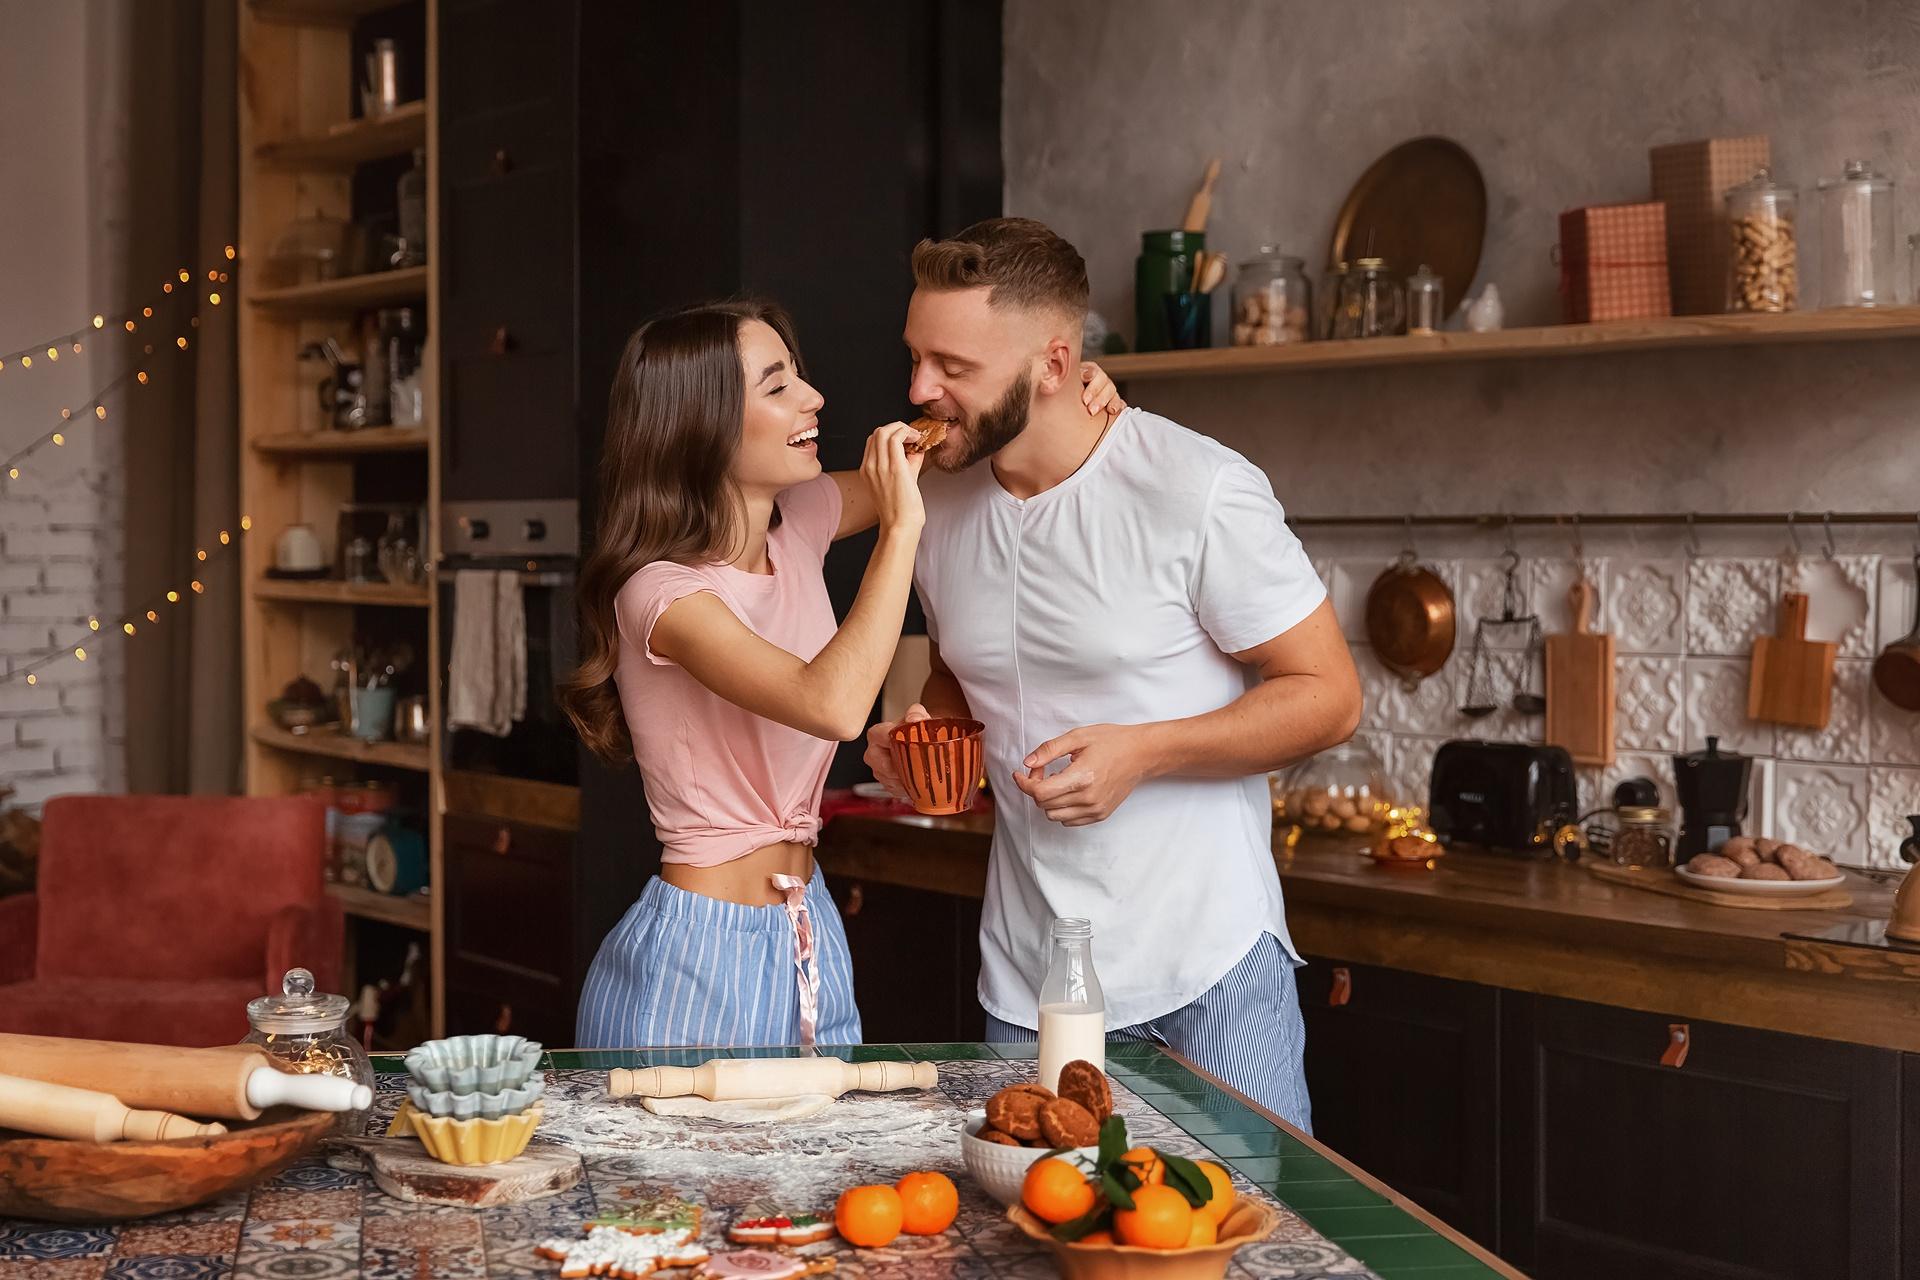 Идеи фотосессии для мужчин на кухне плечо аксессуар